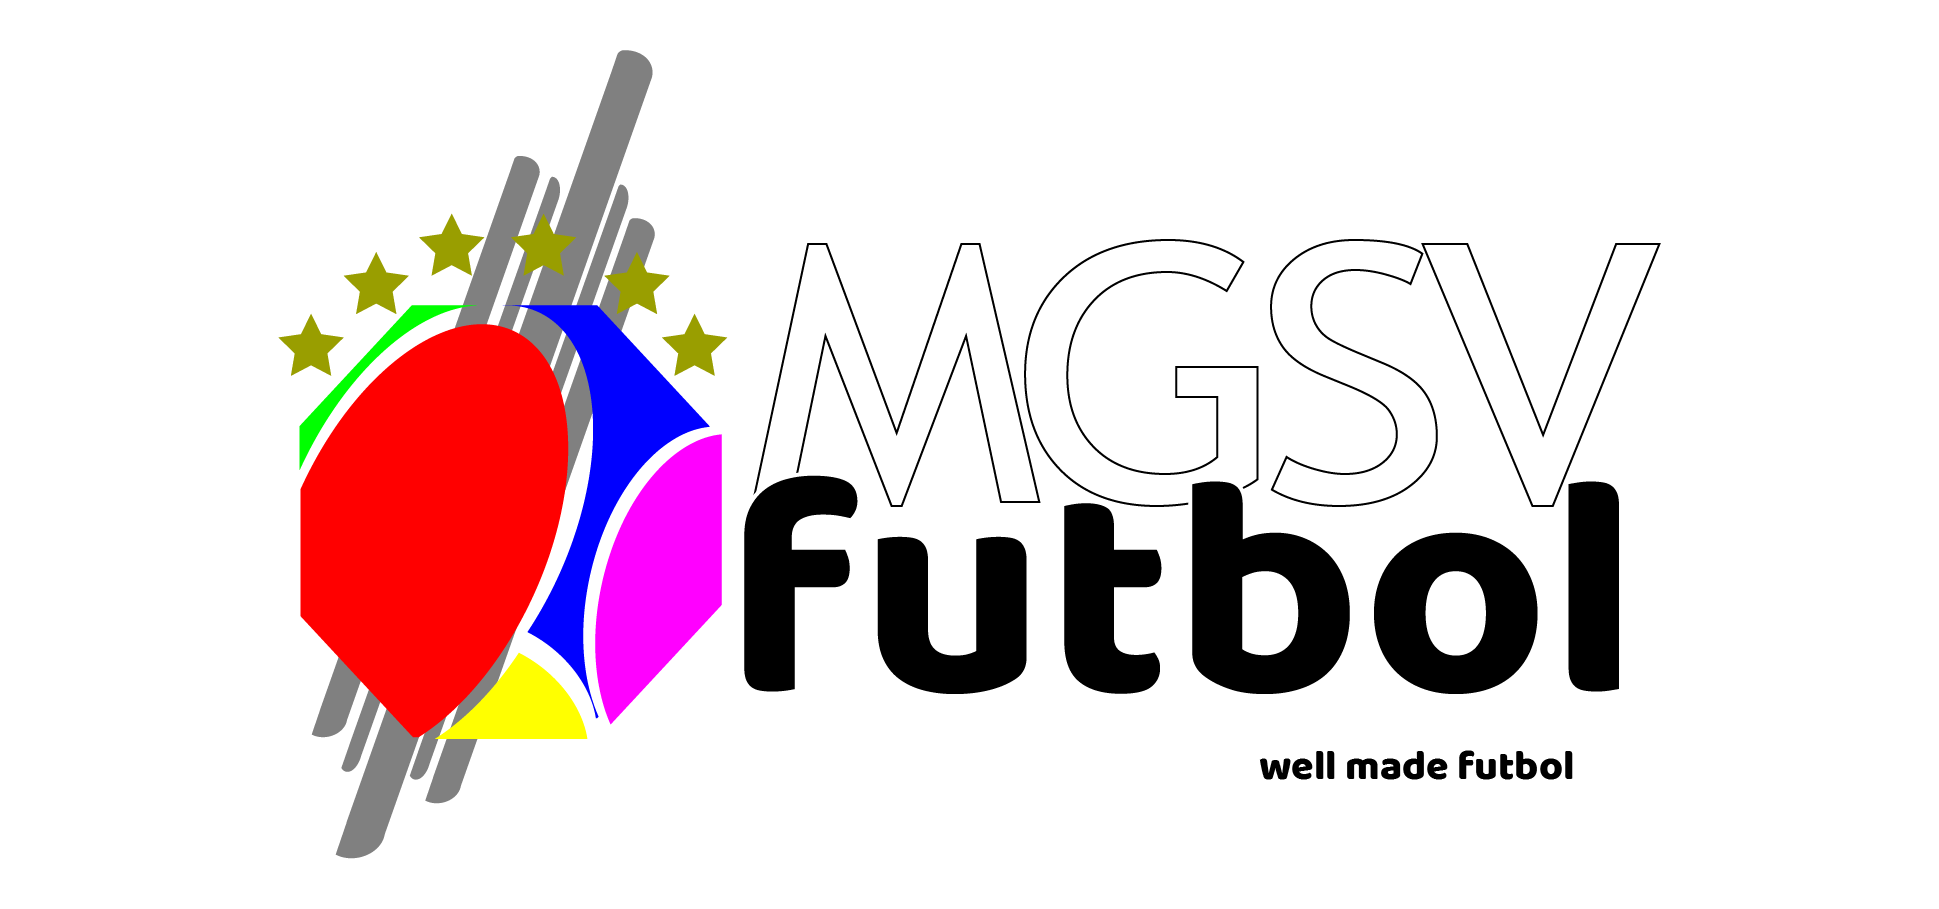 MGSVfutbol